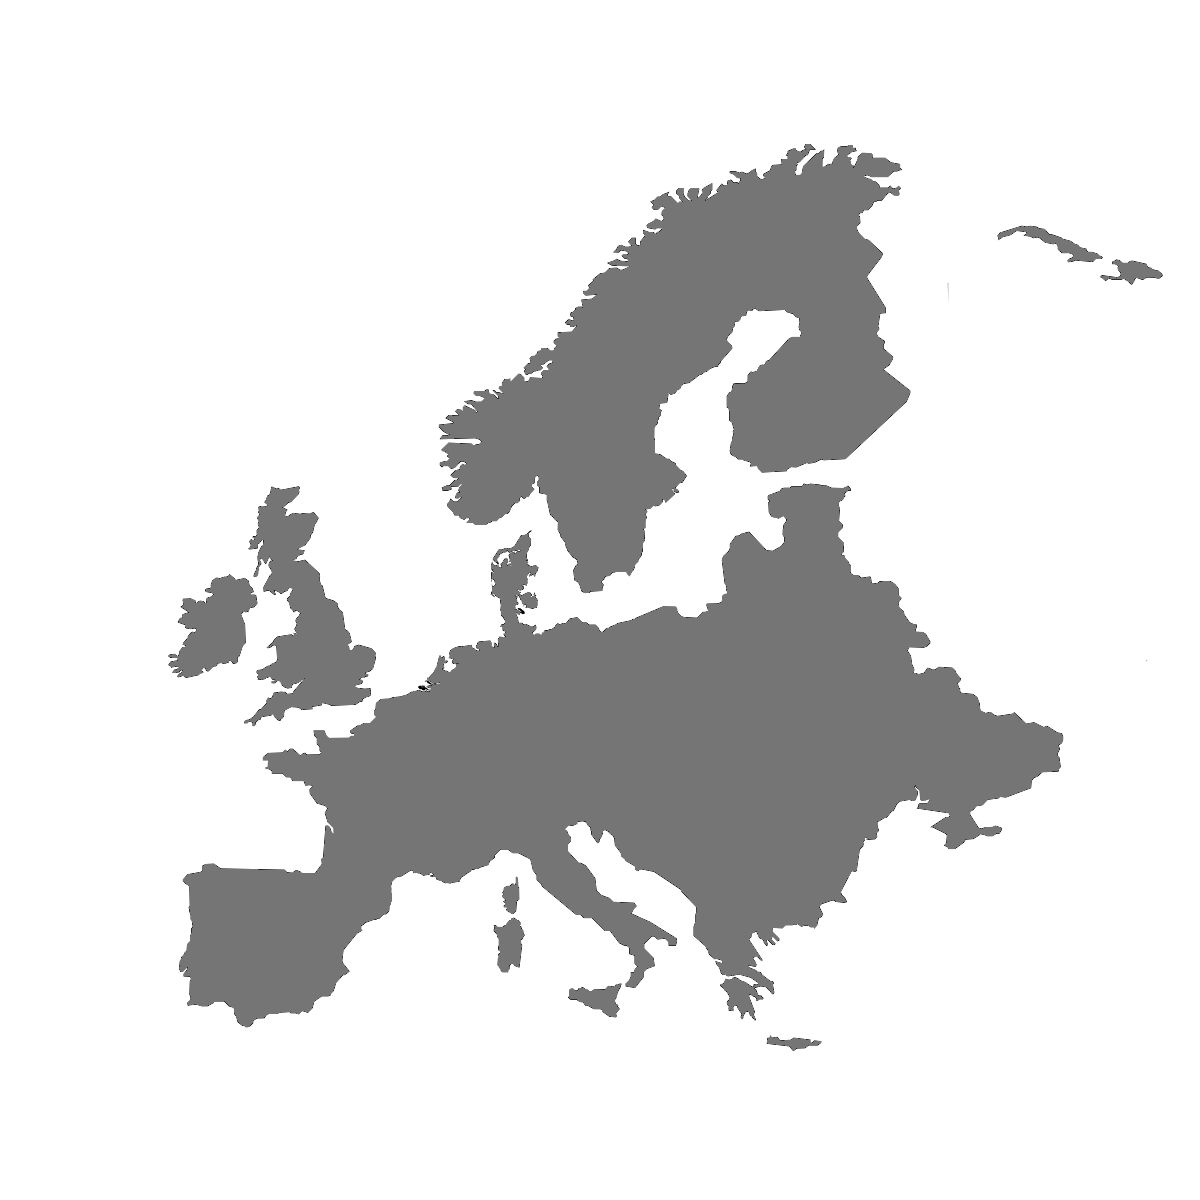 europe clipart transparent